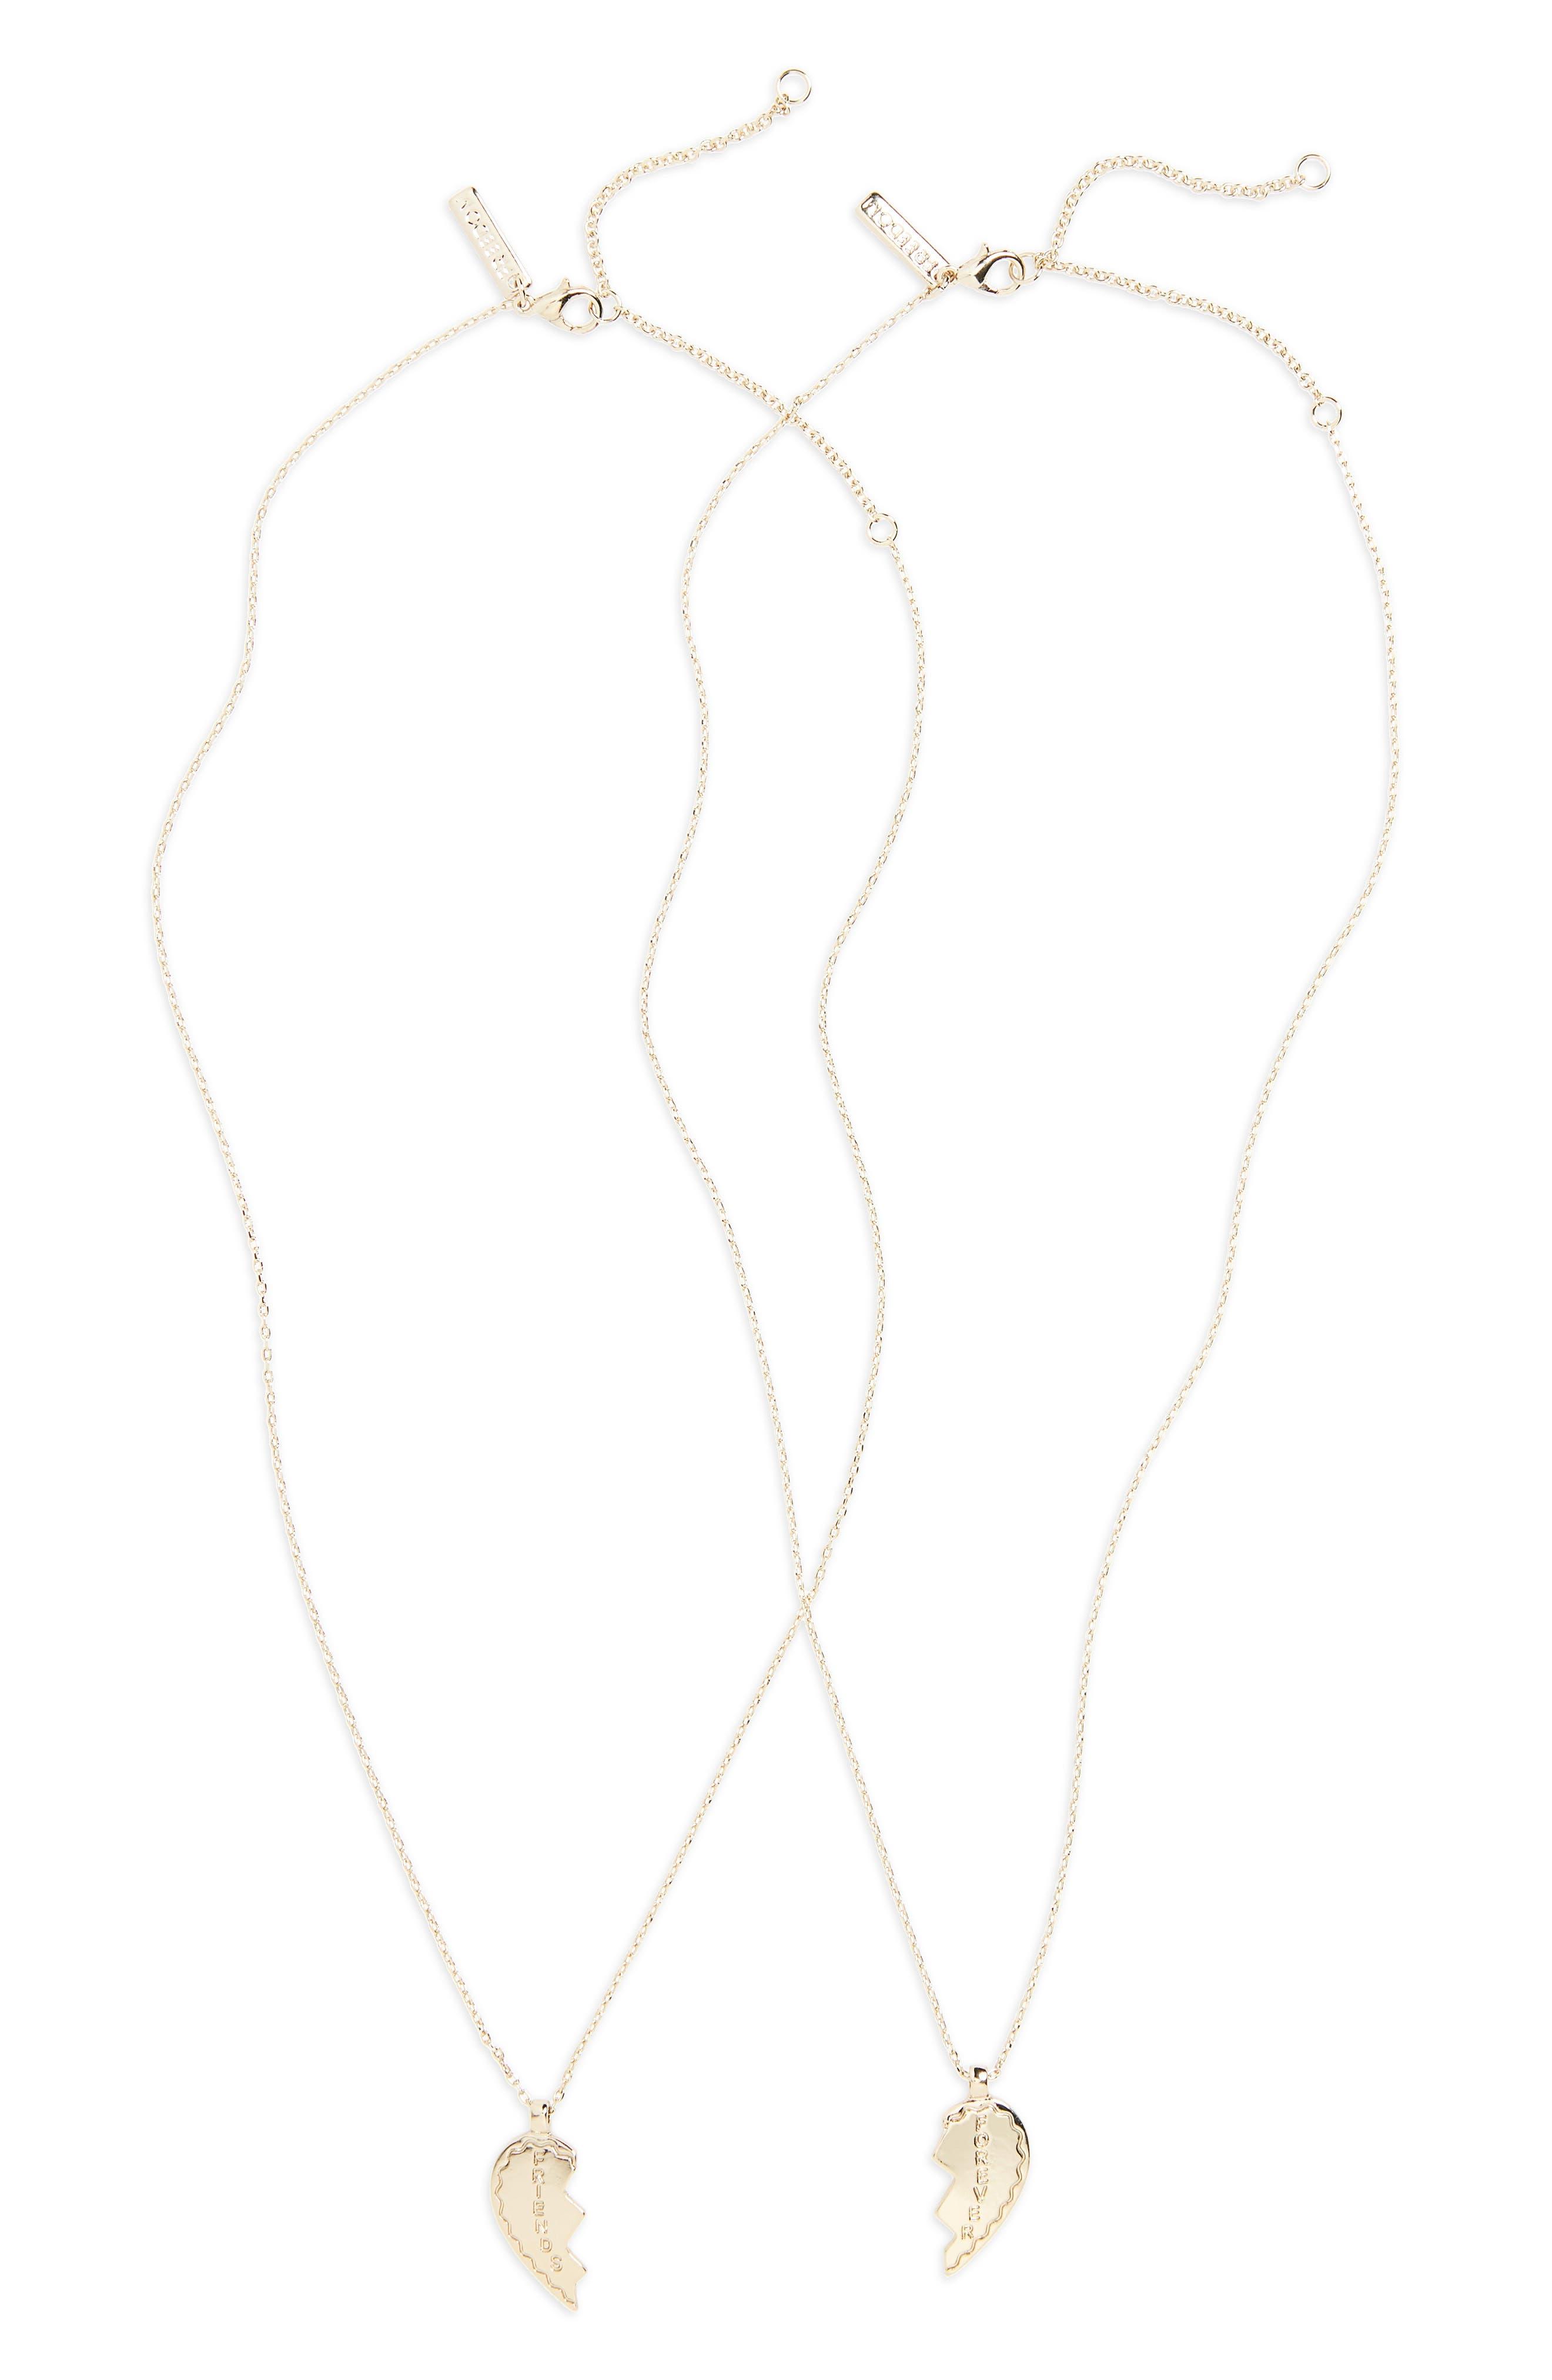 Gal Broken Heart Pendant Necklace,                         Main,                         color,